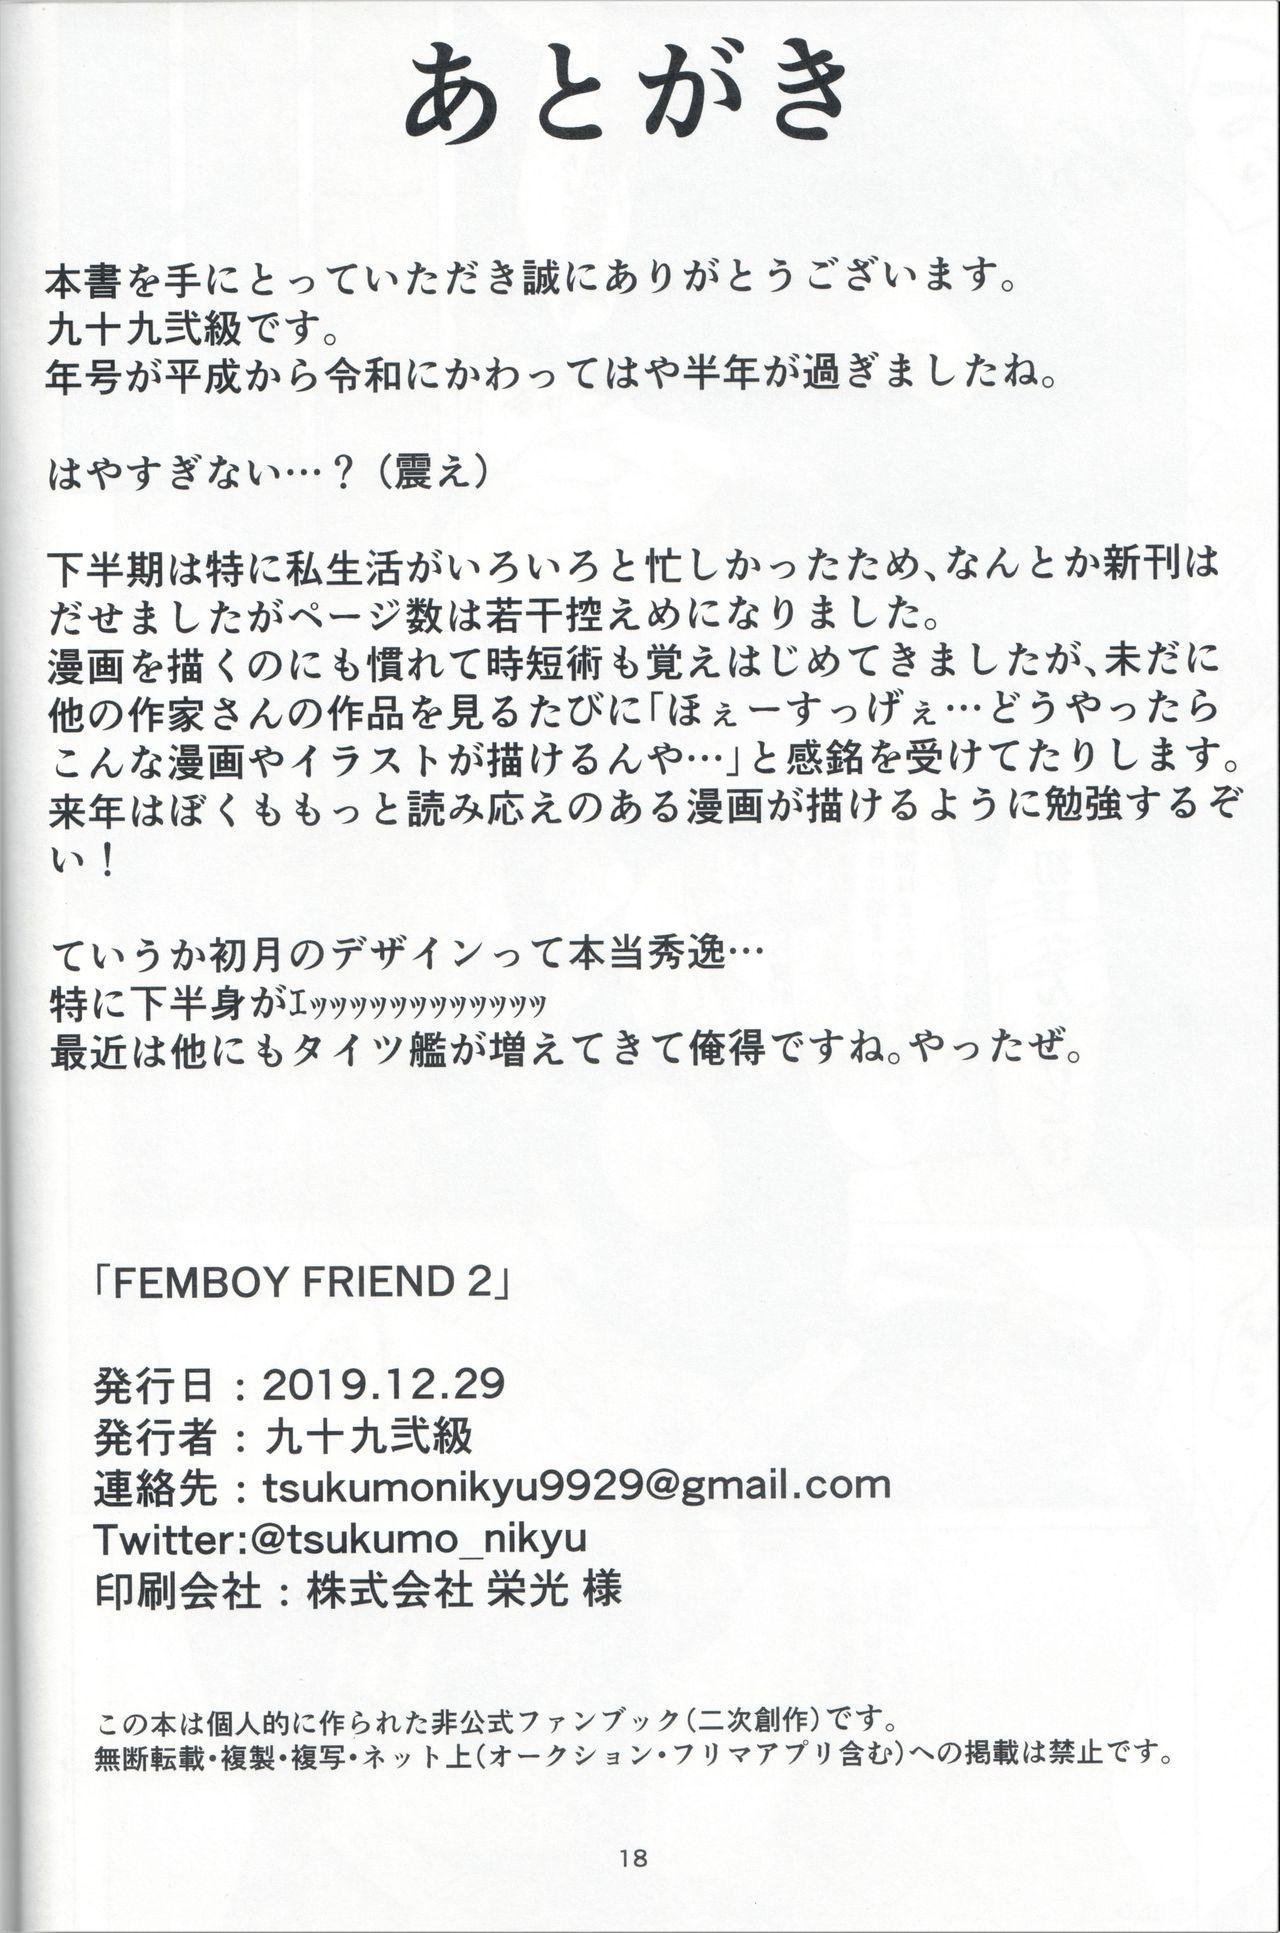 FEMBOY FRIEND 2 16